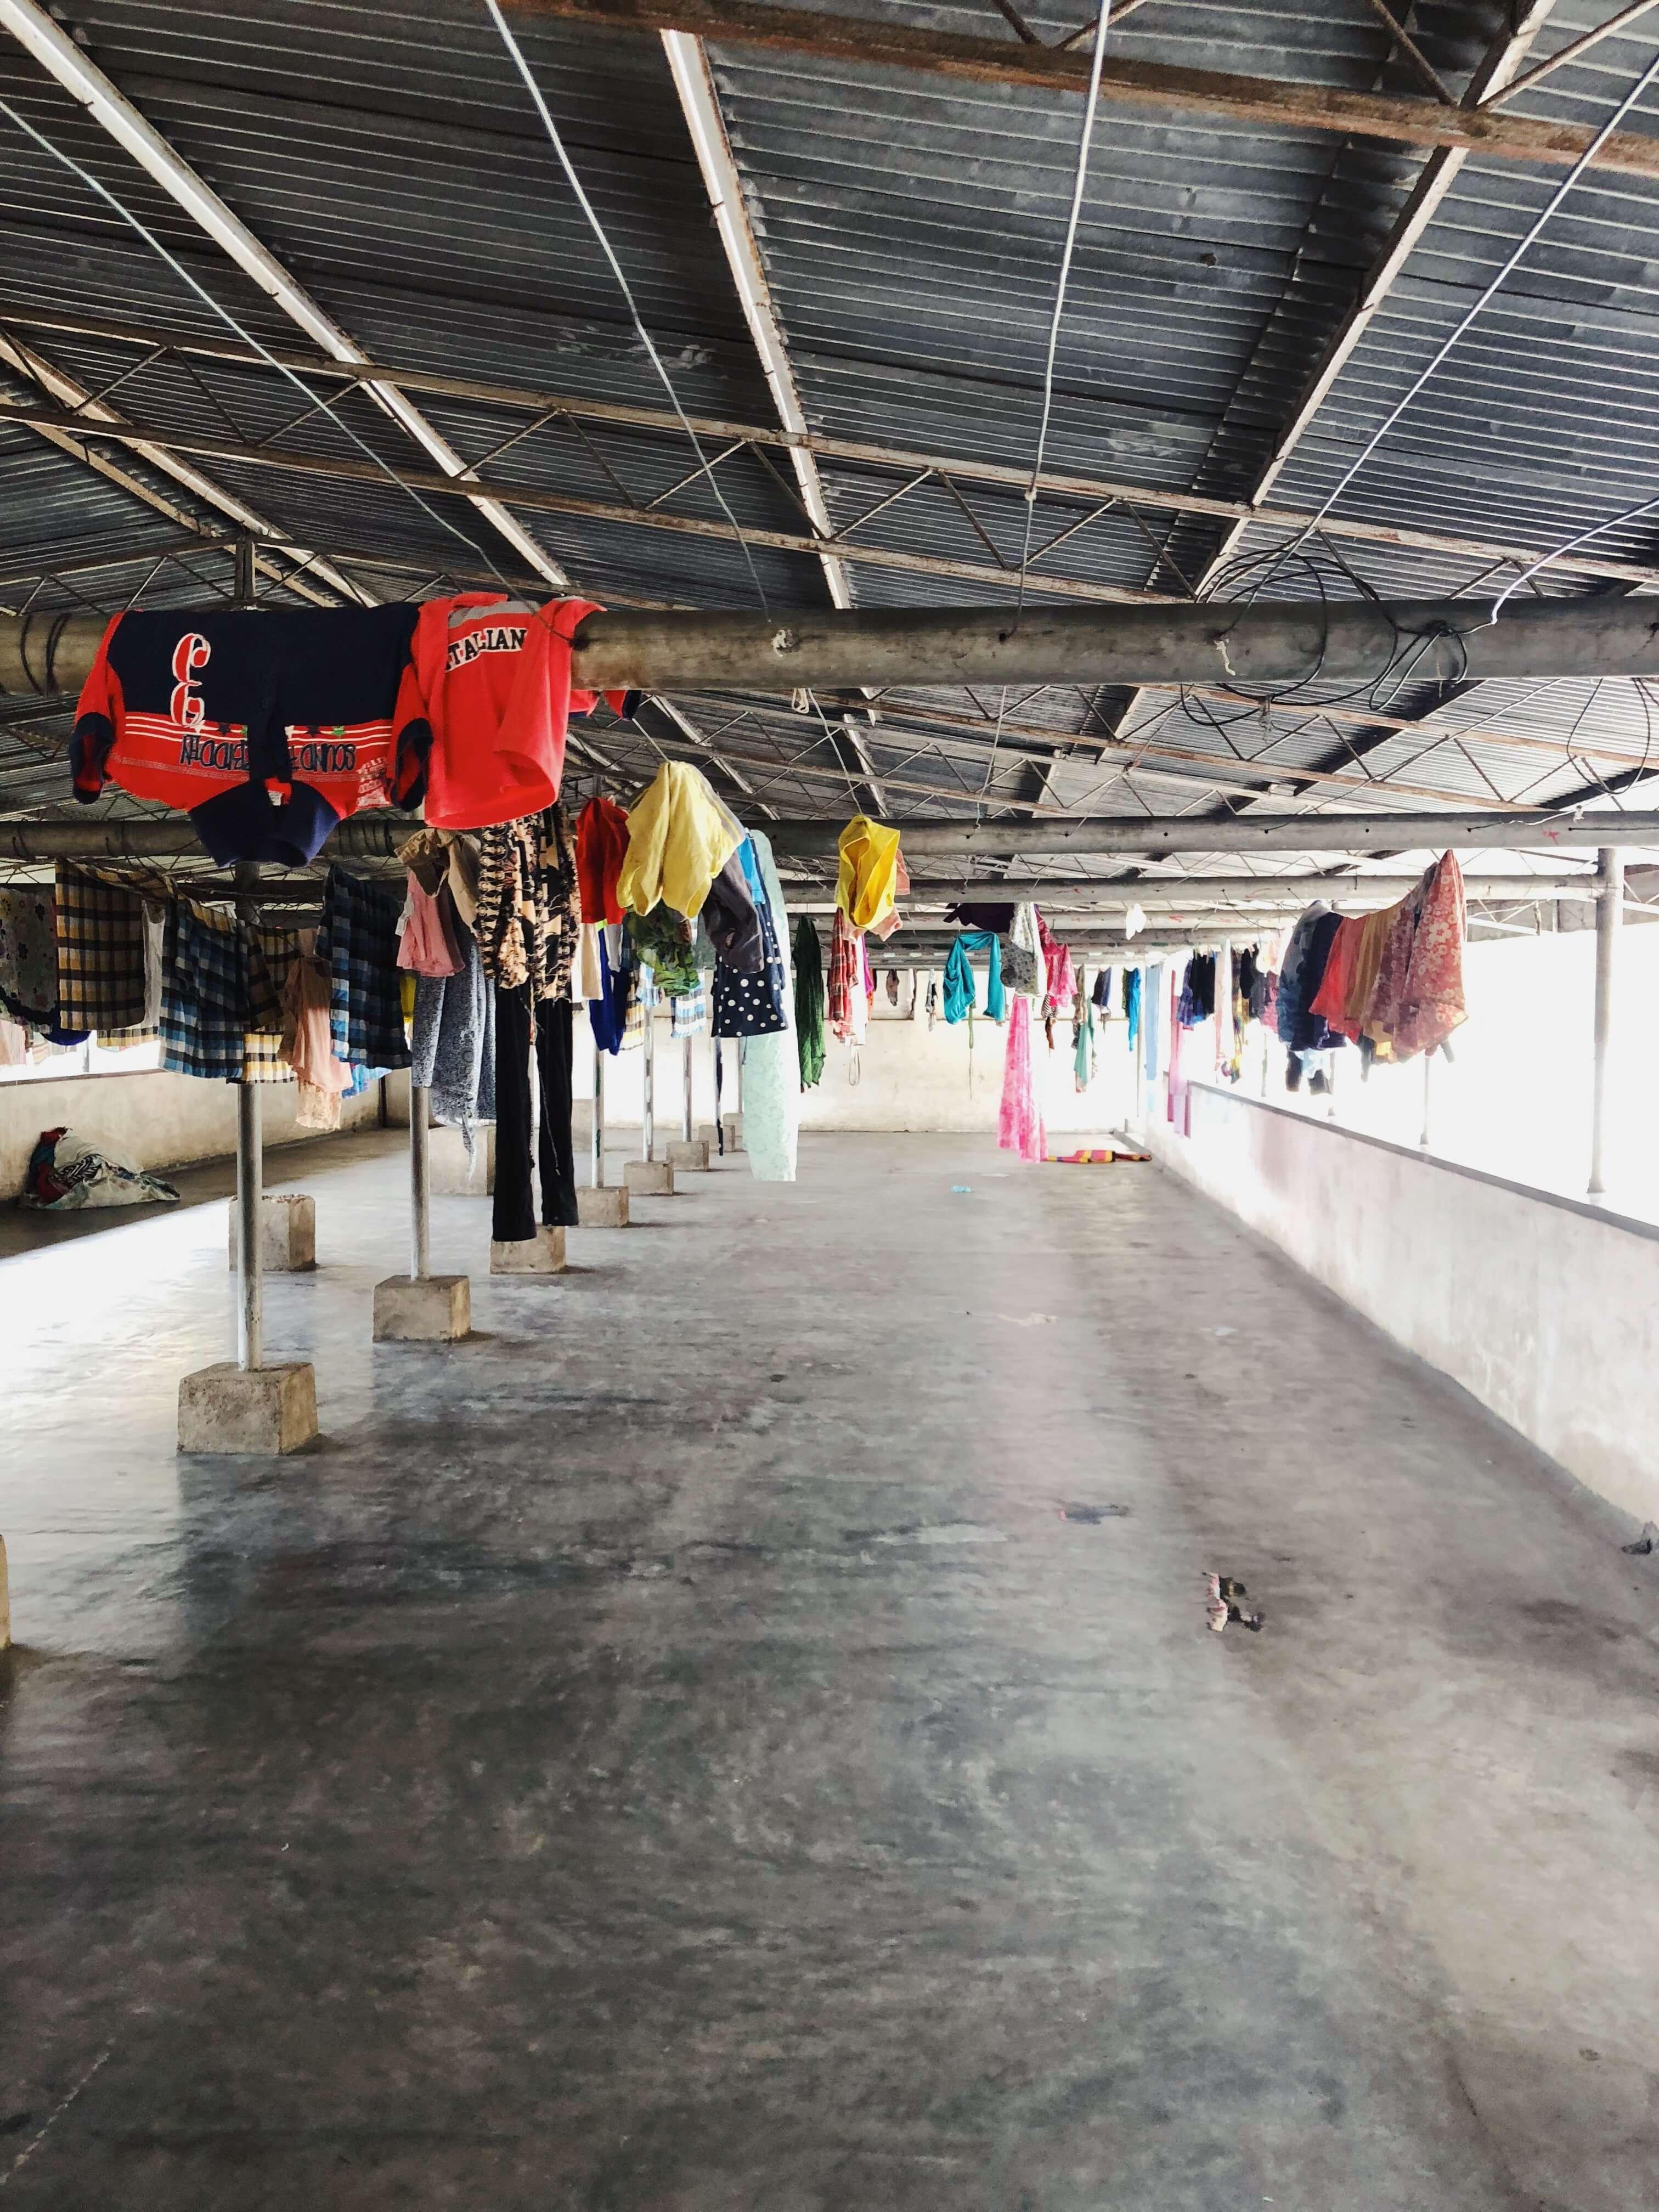 Daya Nivasa's laundry room